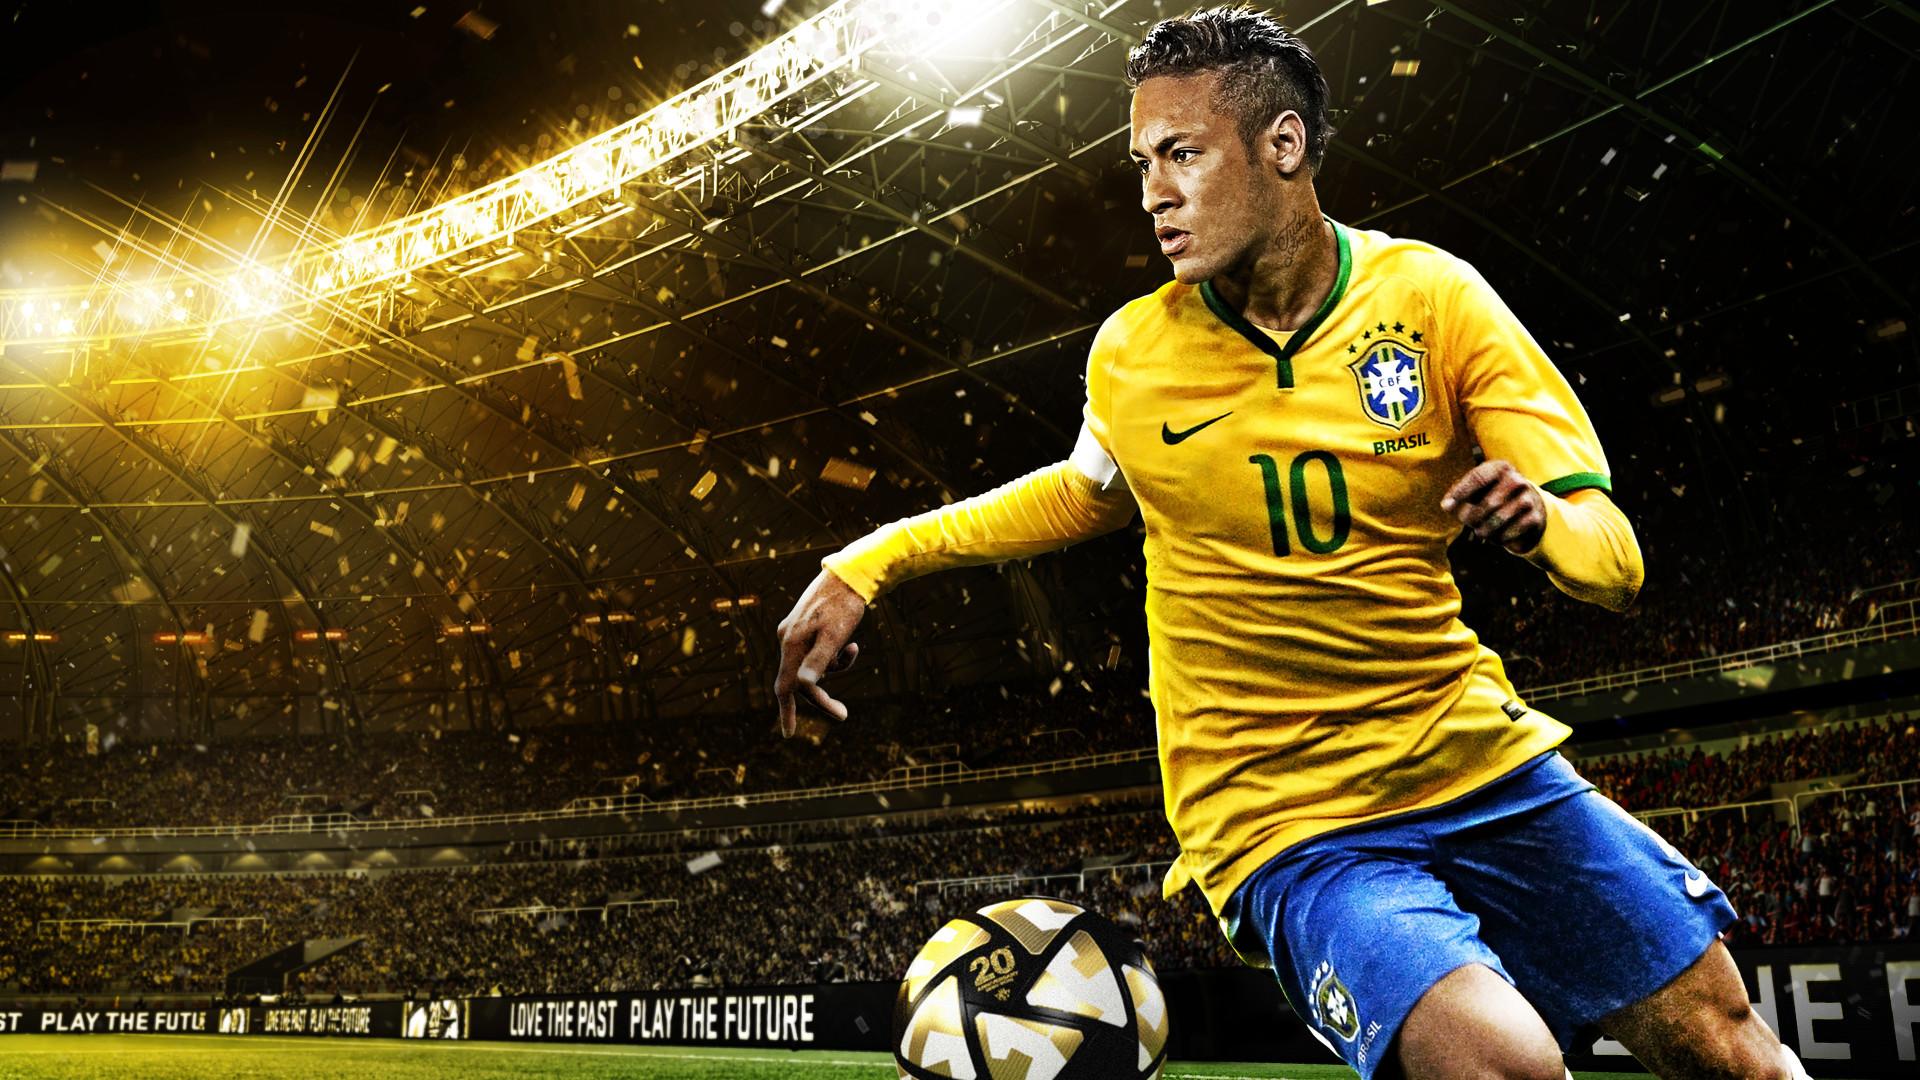 Neymar jr wallpaper 2018 hd 76 images - Neymar brazil hd ...